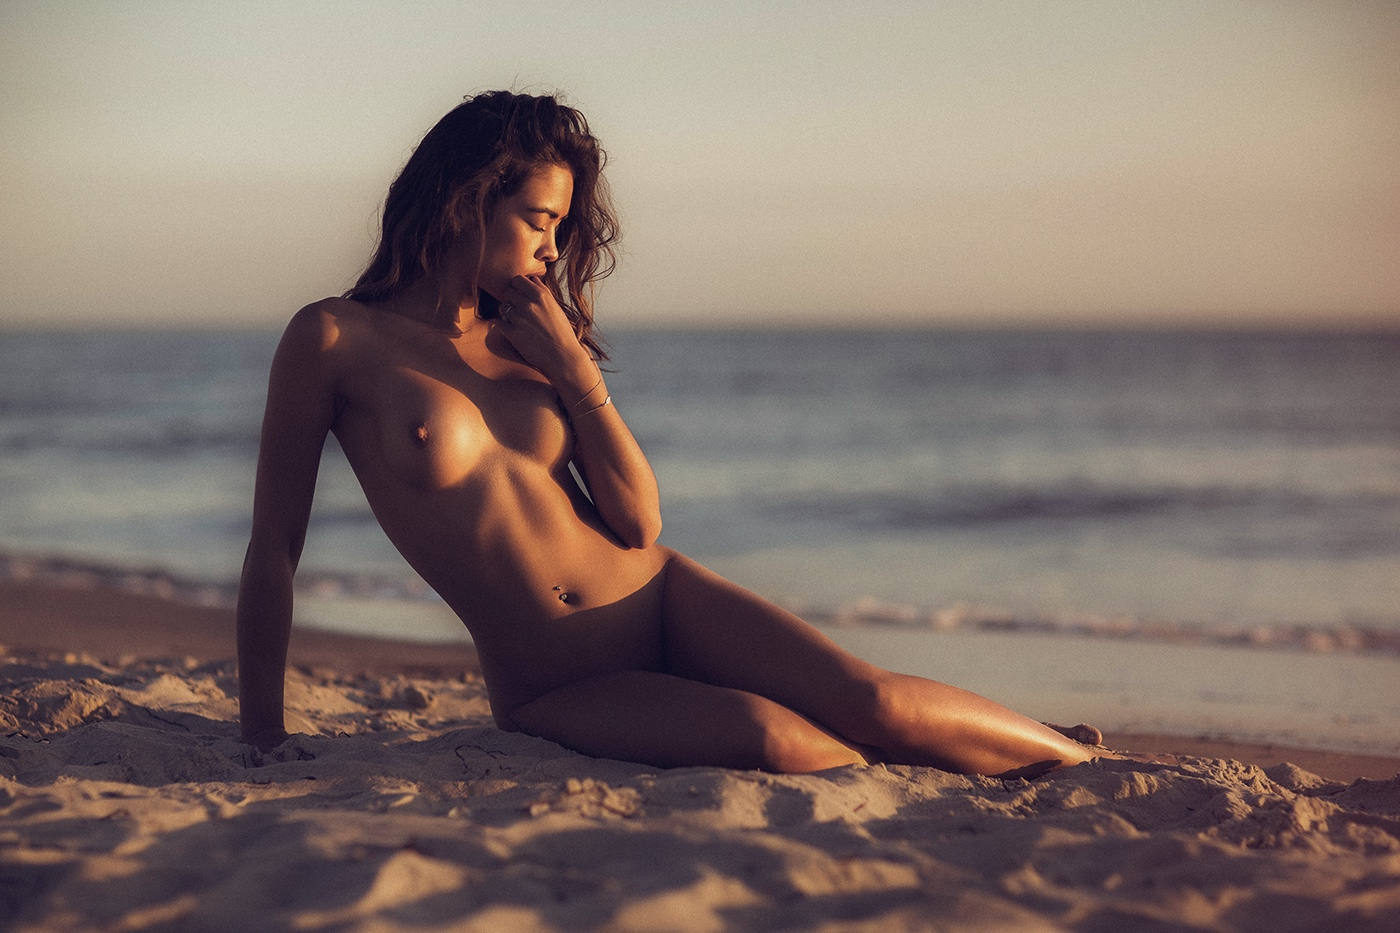 Sofie Mariwan / фотограф Thomas Agatz